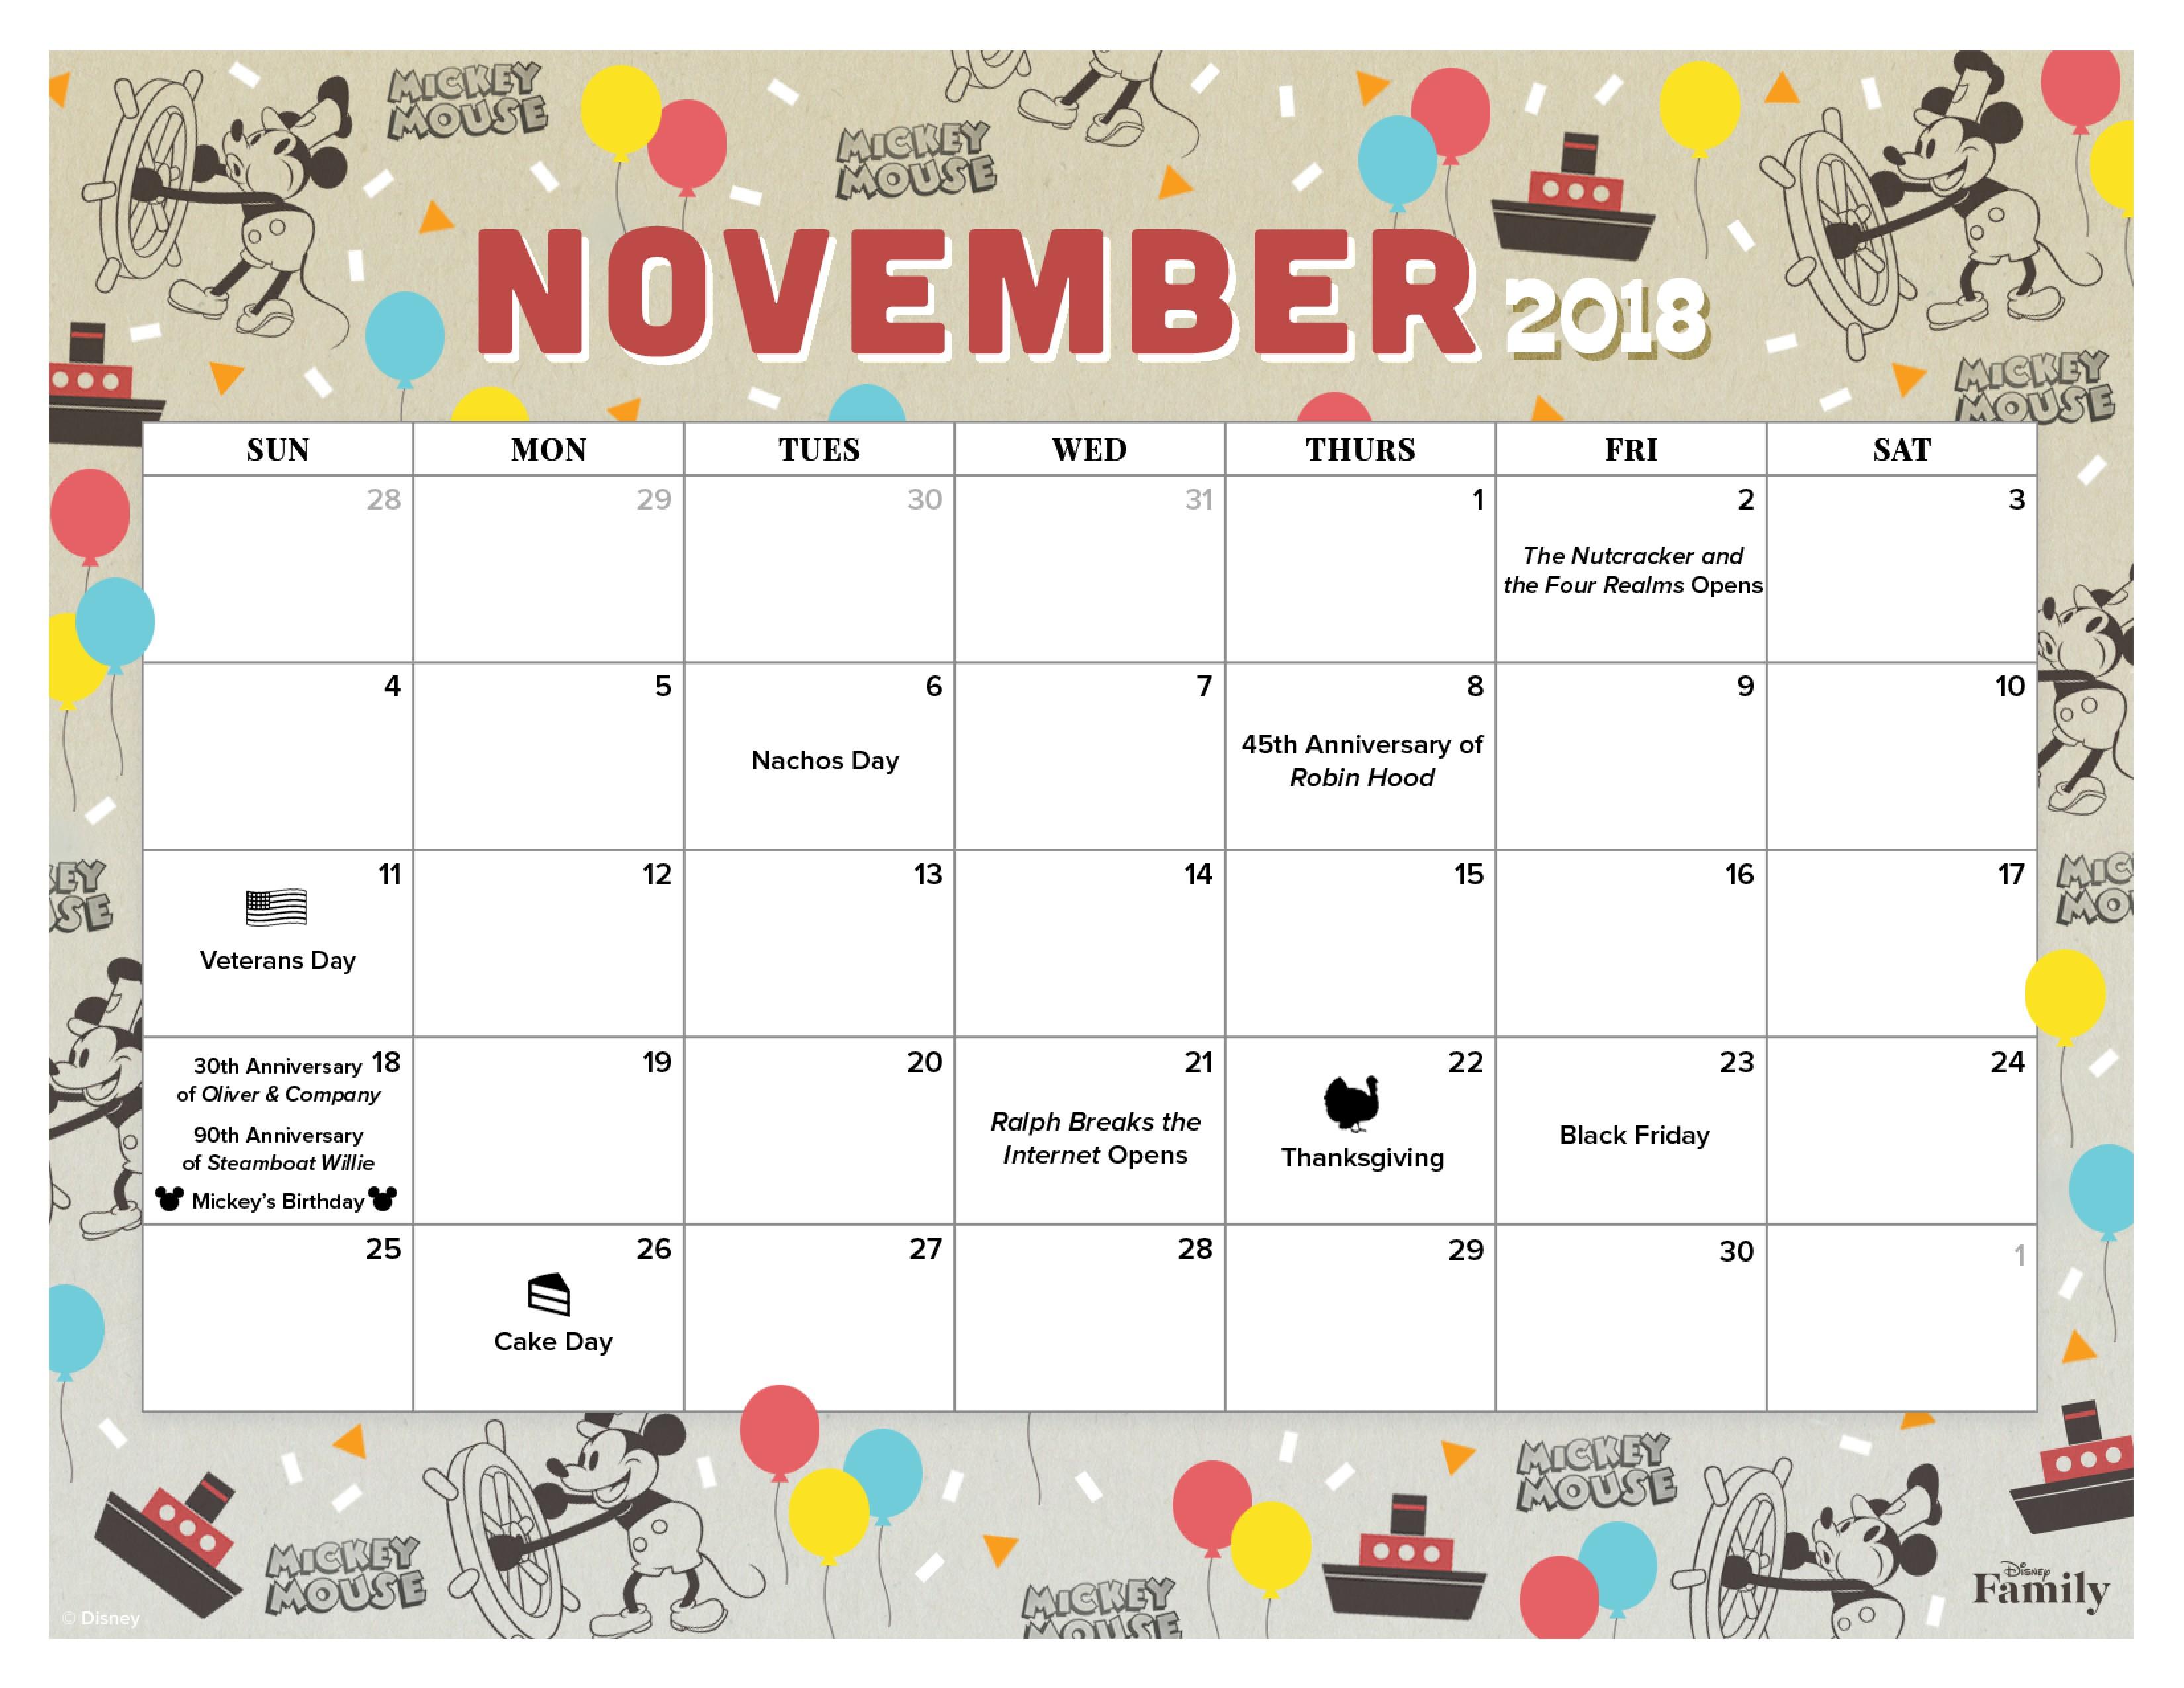 Disney Printable Calendar November 2018 Calendar for the whole Family